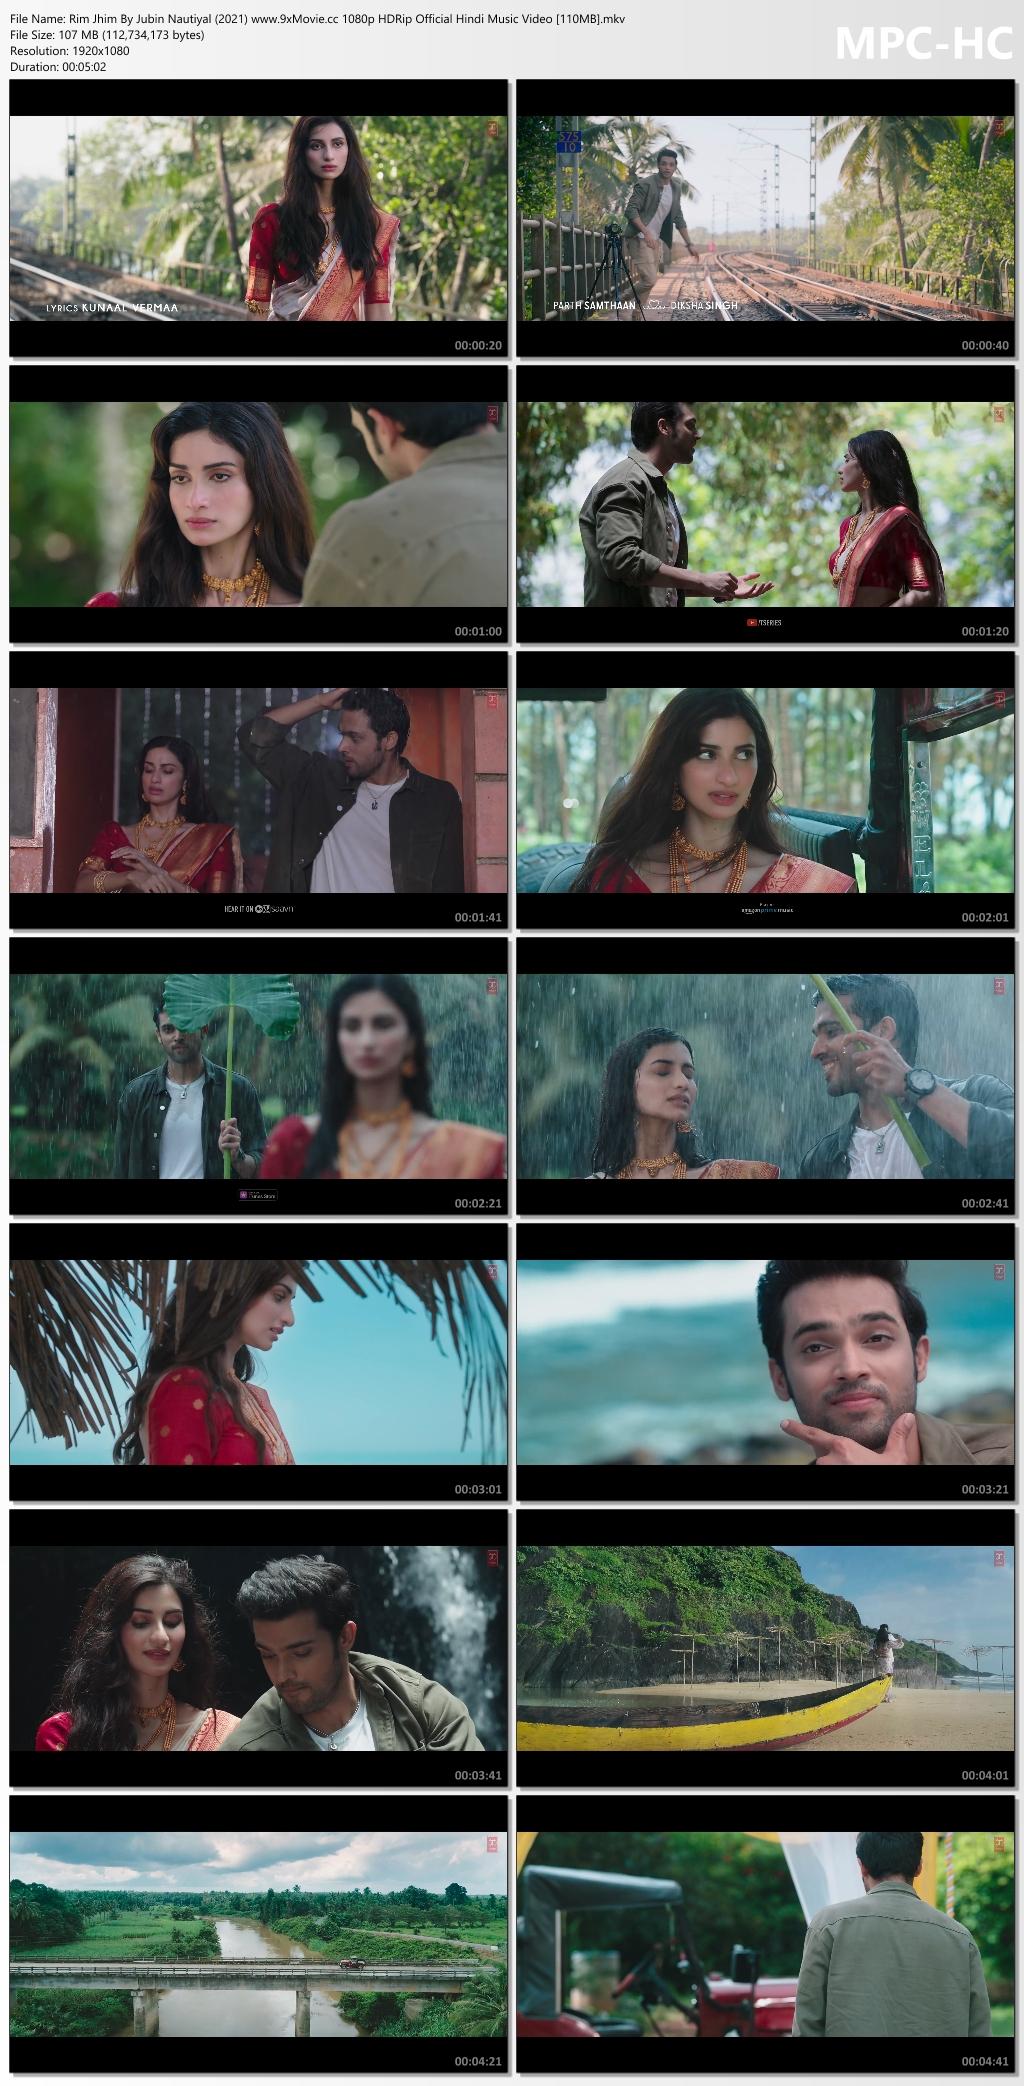 Rim-Jhim-By-Jubin-Nautiyal-2021-www-9x-Movie-cc-1080p-HDRip-Official-Hindi-Music-Video-110-MB-mkv